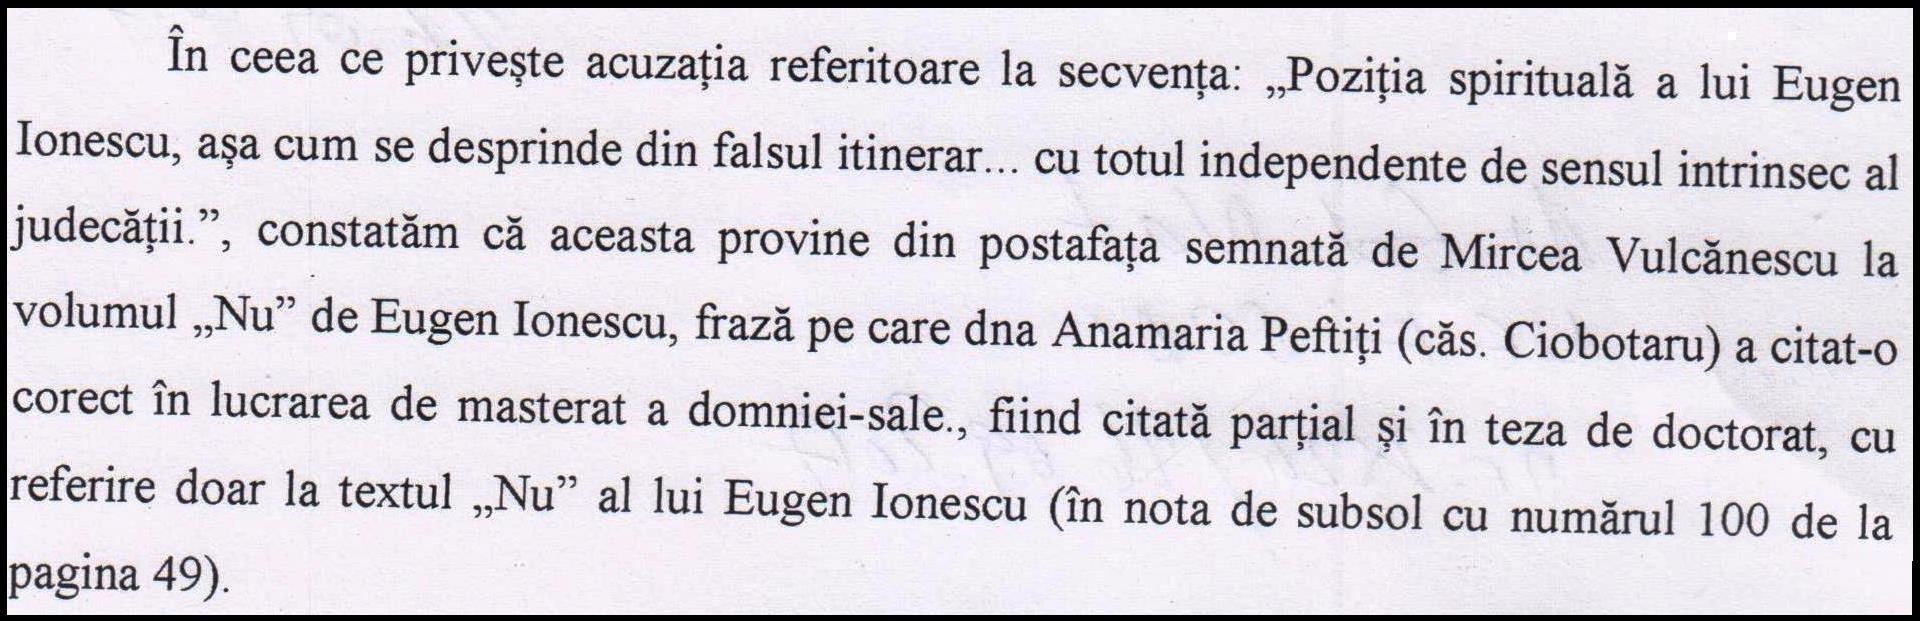 6. Pozitia spirituala a lui Eugen Ionescu